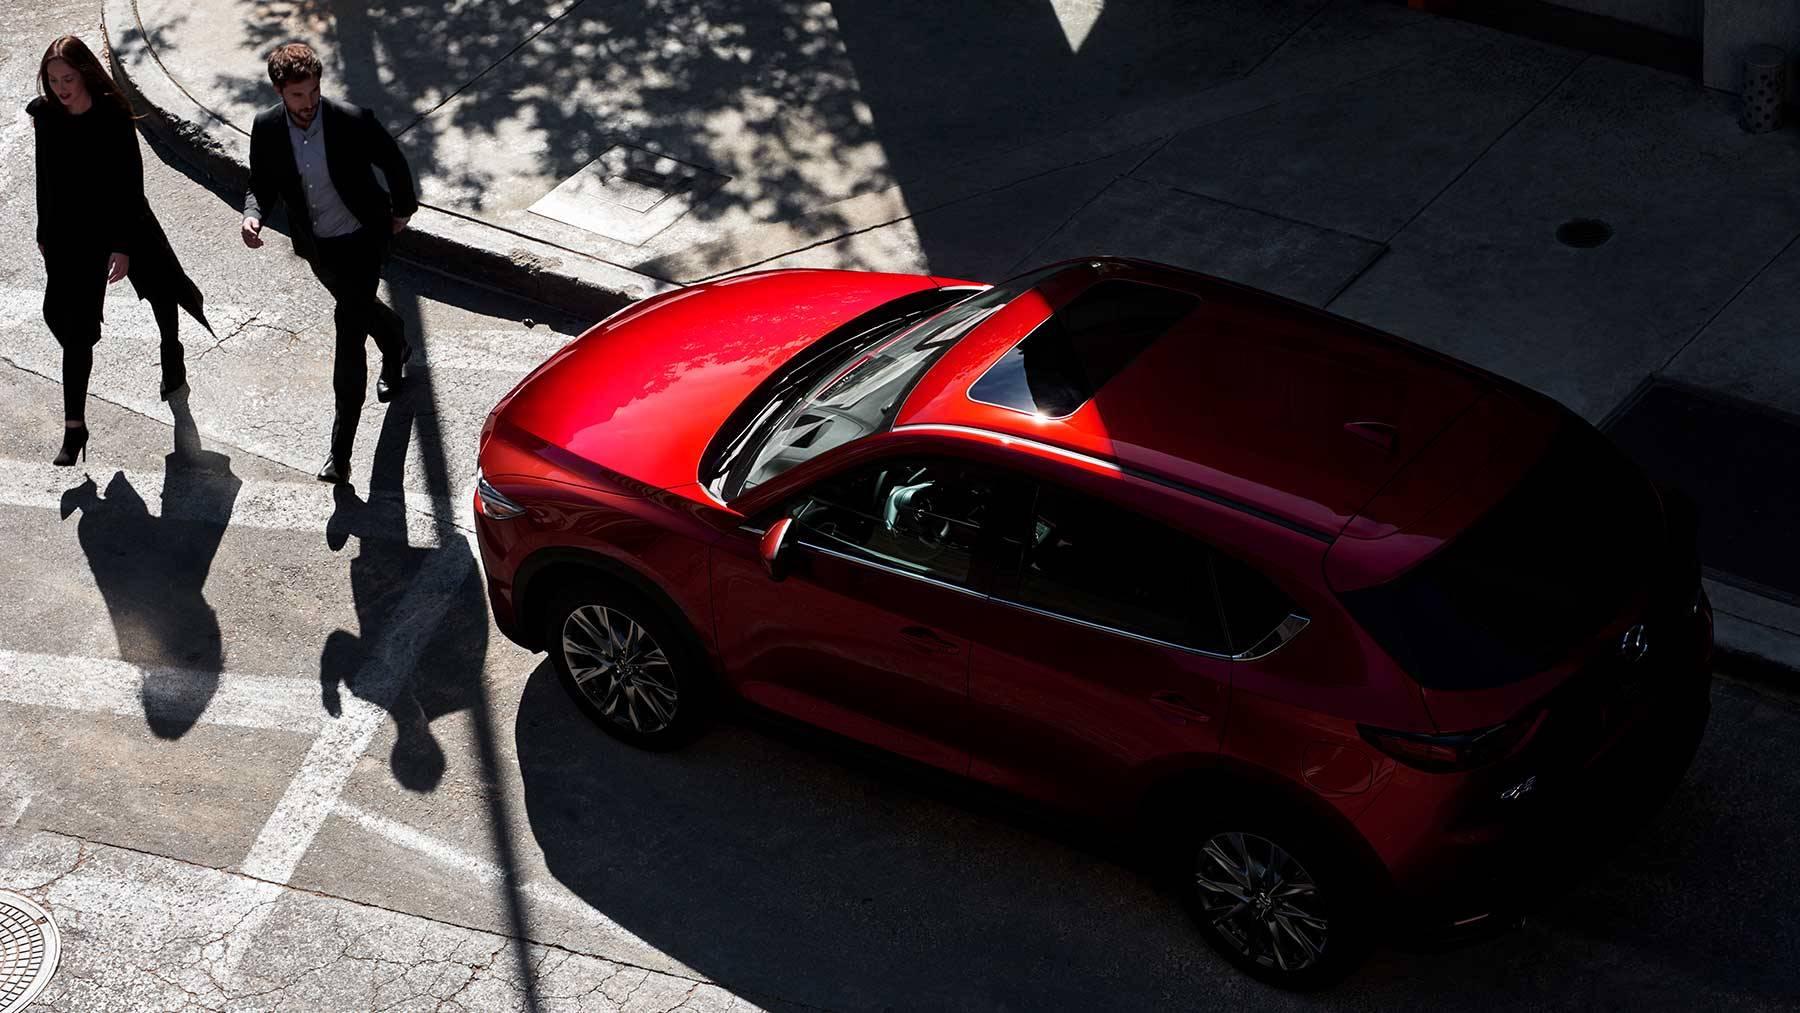 2019 Mazda CX-5 Leasing near Austin, TX